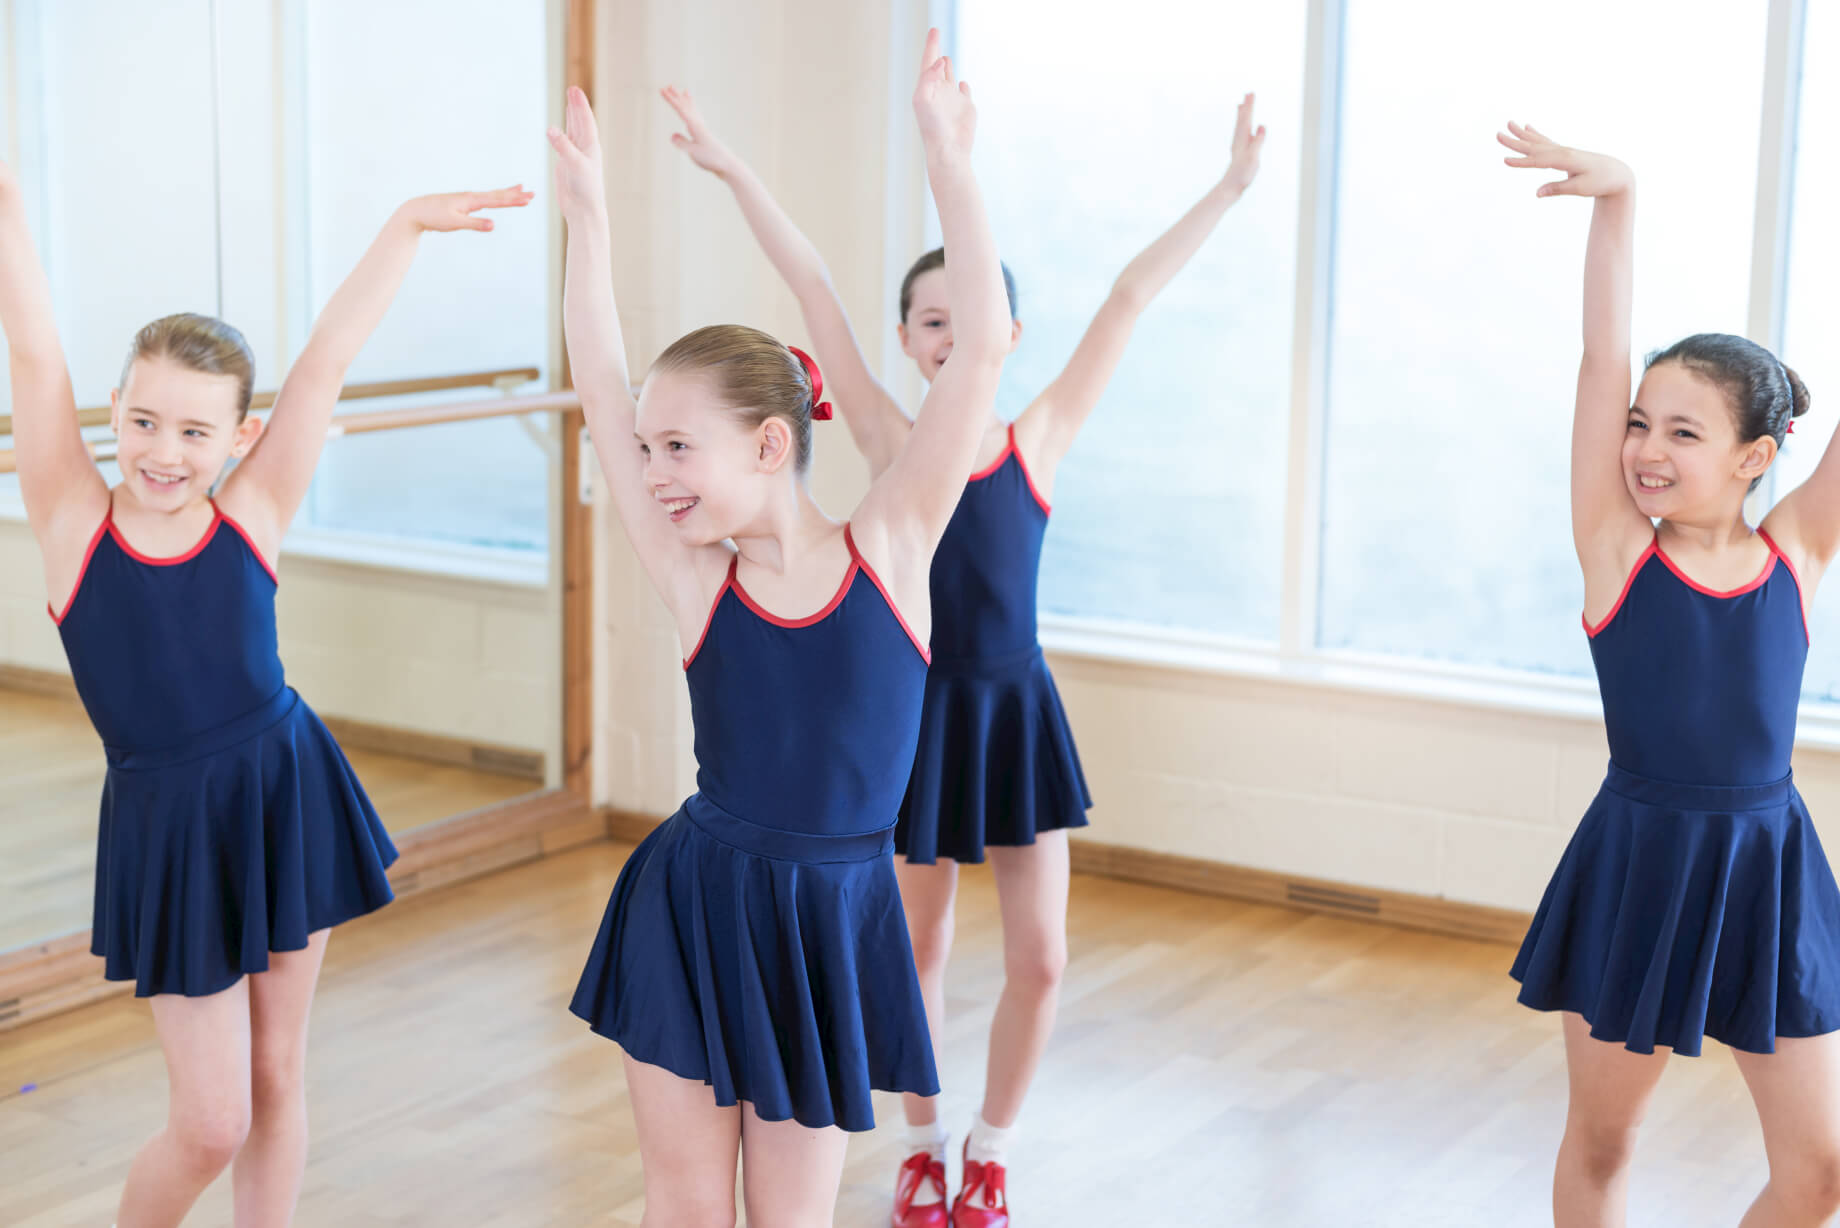 tap-dance-class-girls-arms-in-the-air-rnsd-rutleigh-norris-school-of-dance.jpg